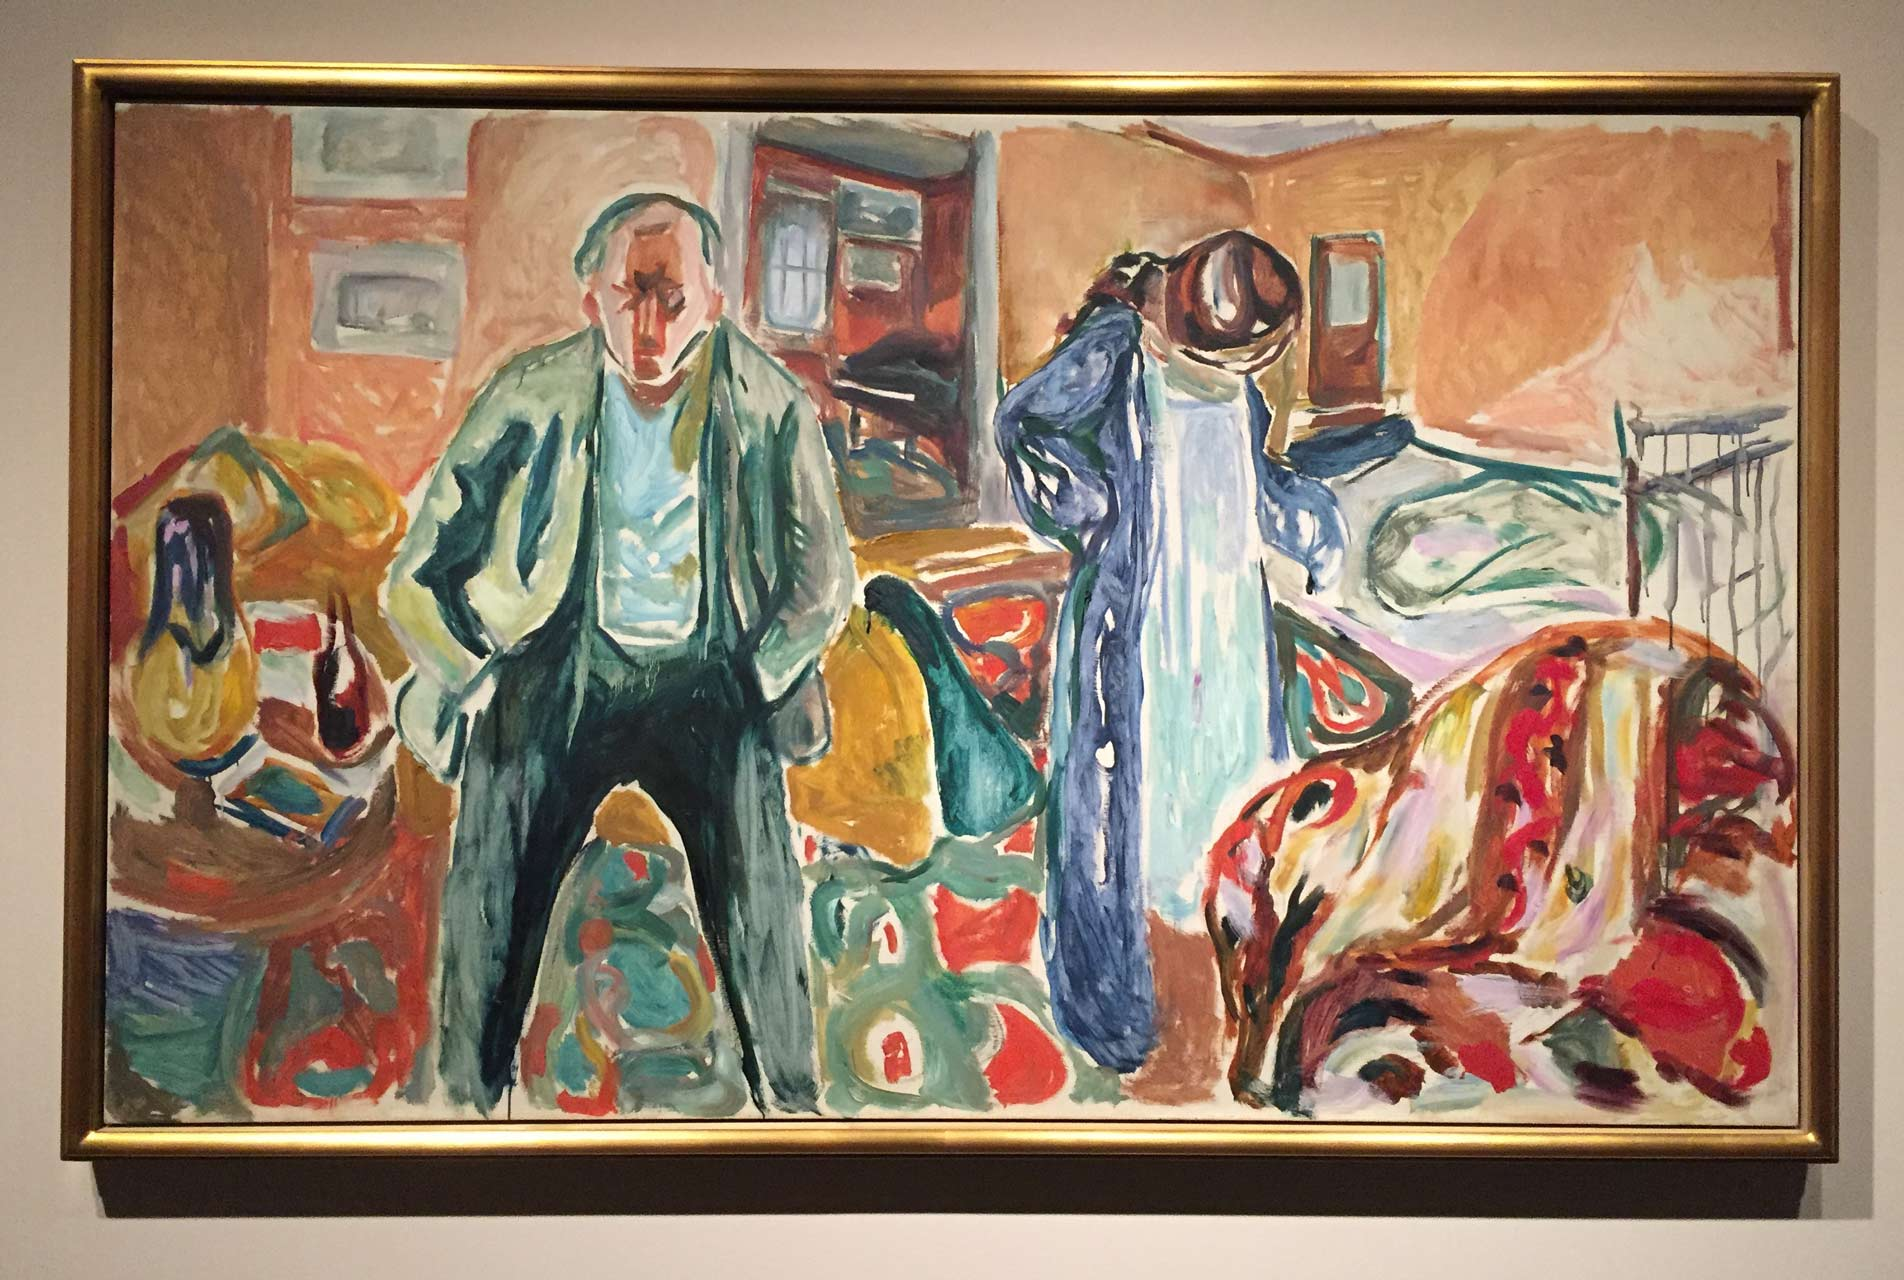 Edvard-Munch-Artist-His-Model-1919-21-Munch-Museum.jpg